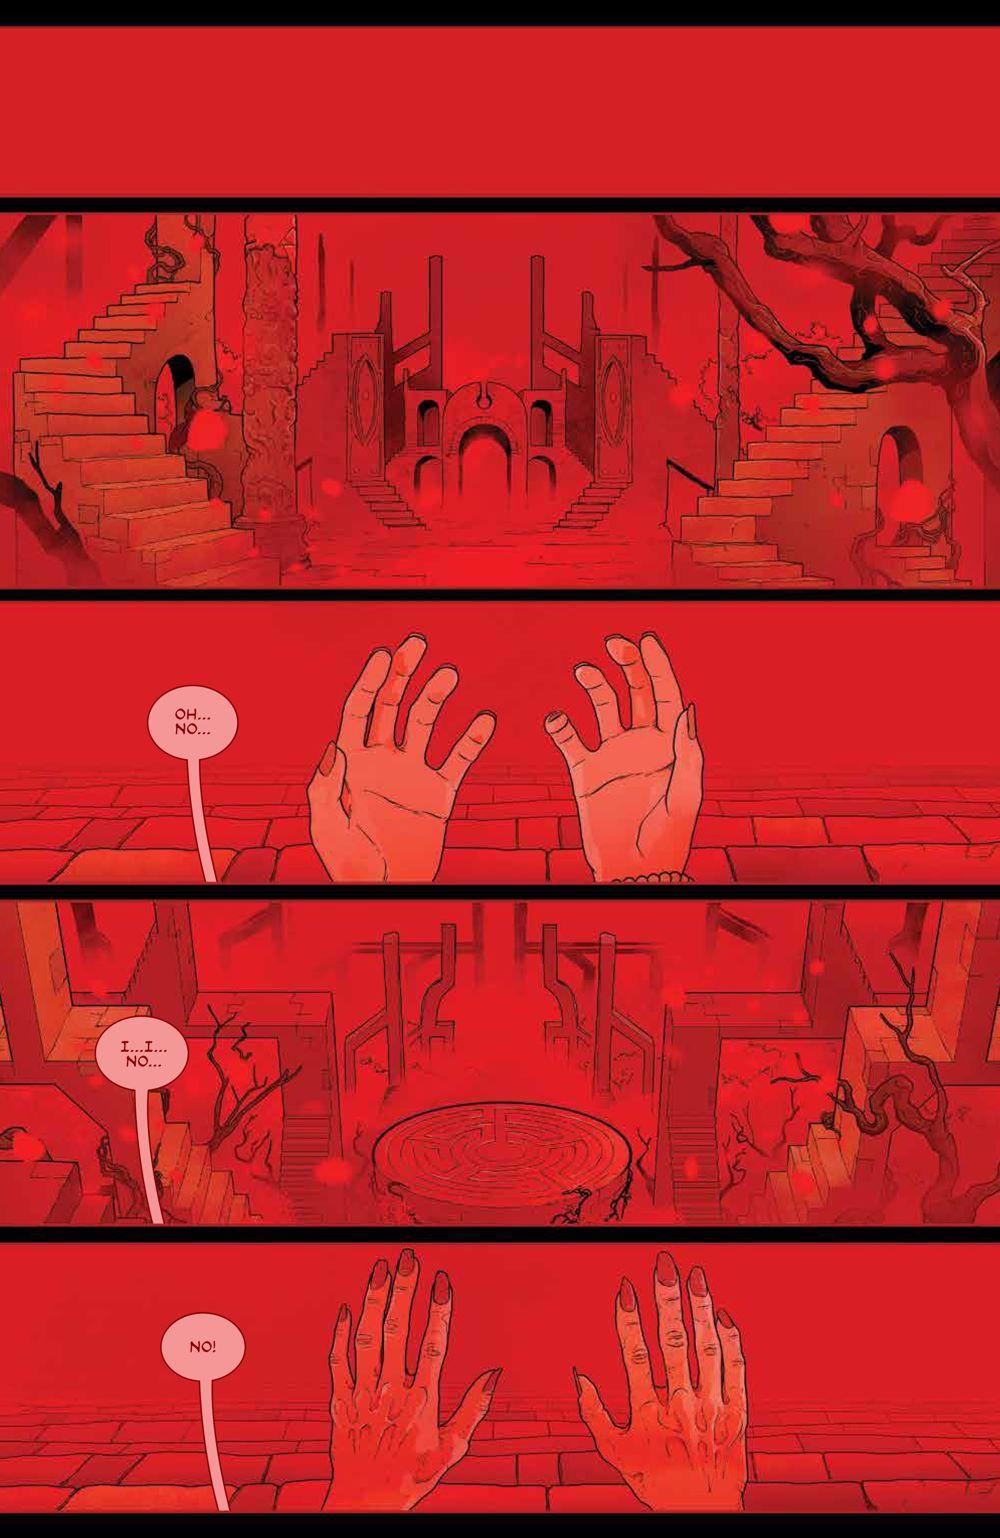 RedMother_v3_SC_PRESS_20 ComicList Previews: RED MOTHER VOLUME 3 TP